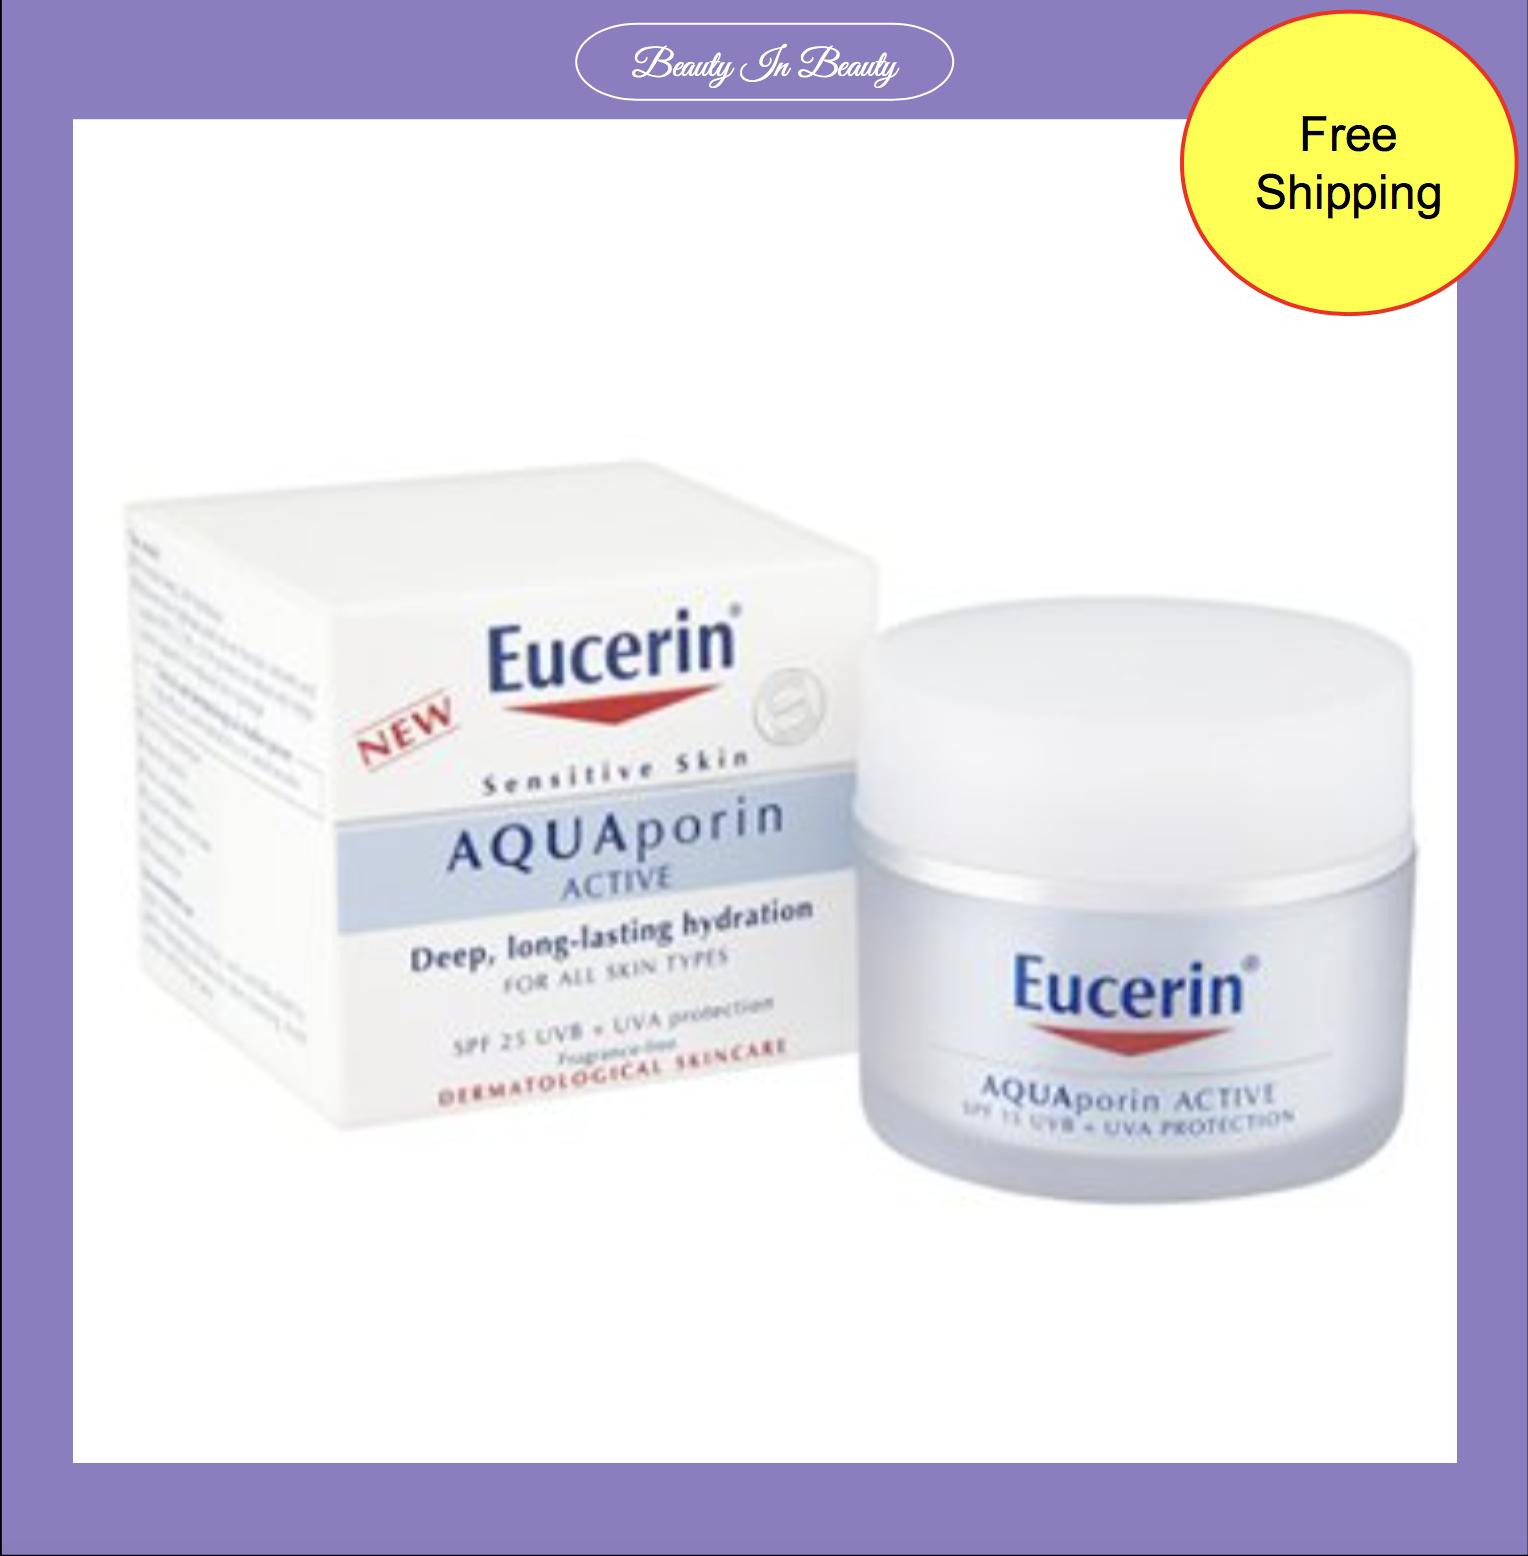 EUCERIN AQUAporin ACTIVE Day Cream SPF25 UVA Long-Lasting Hy